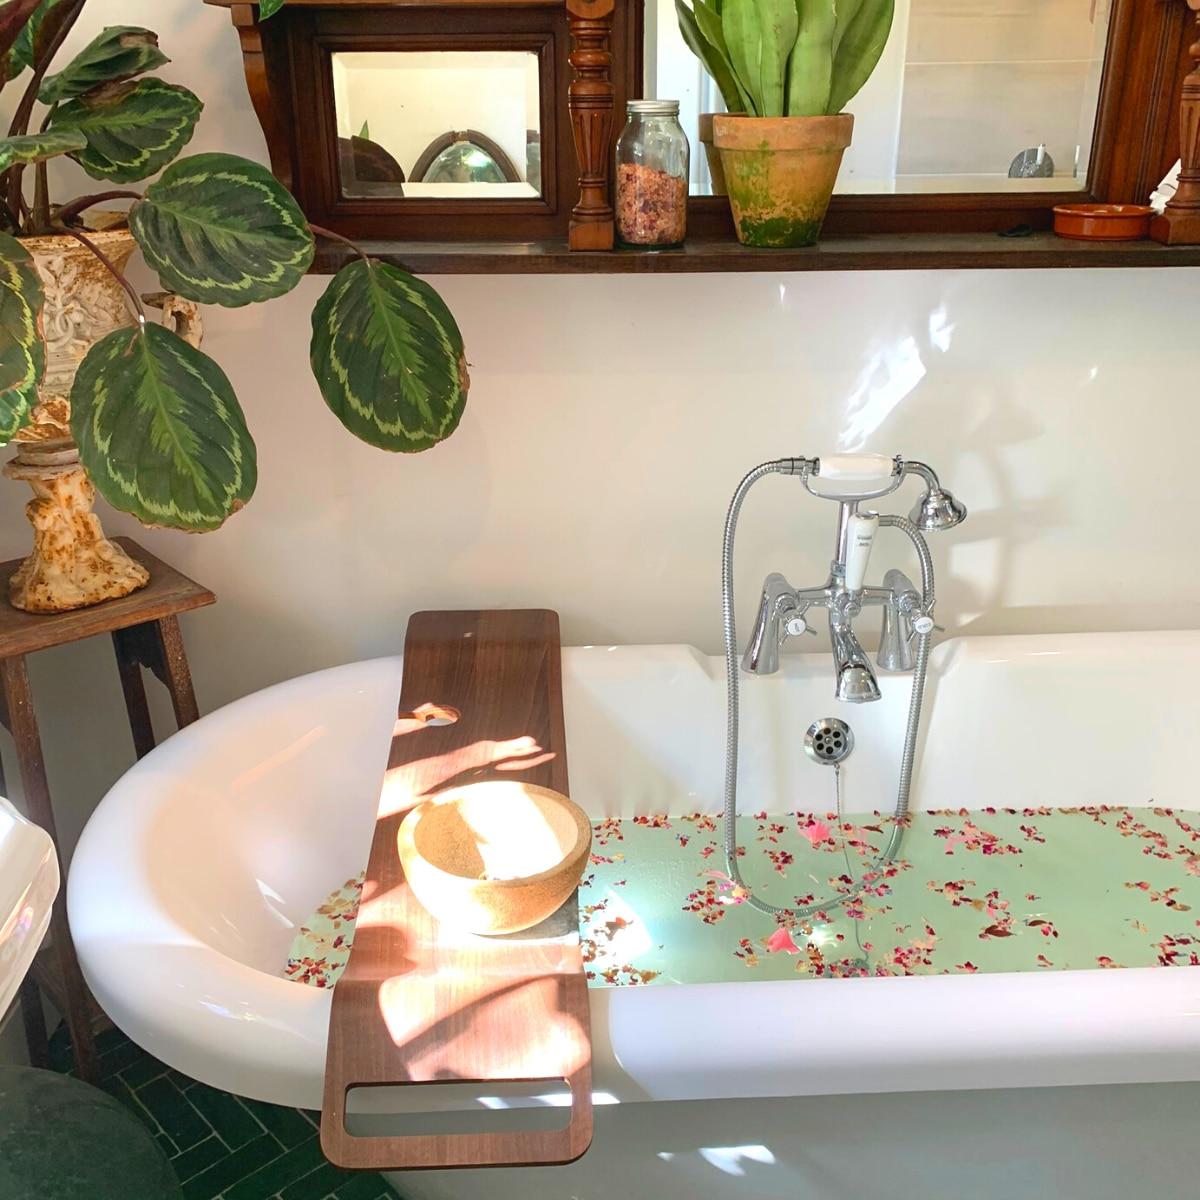 Klorane bath